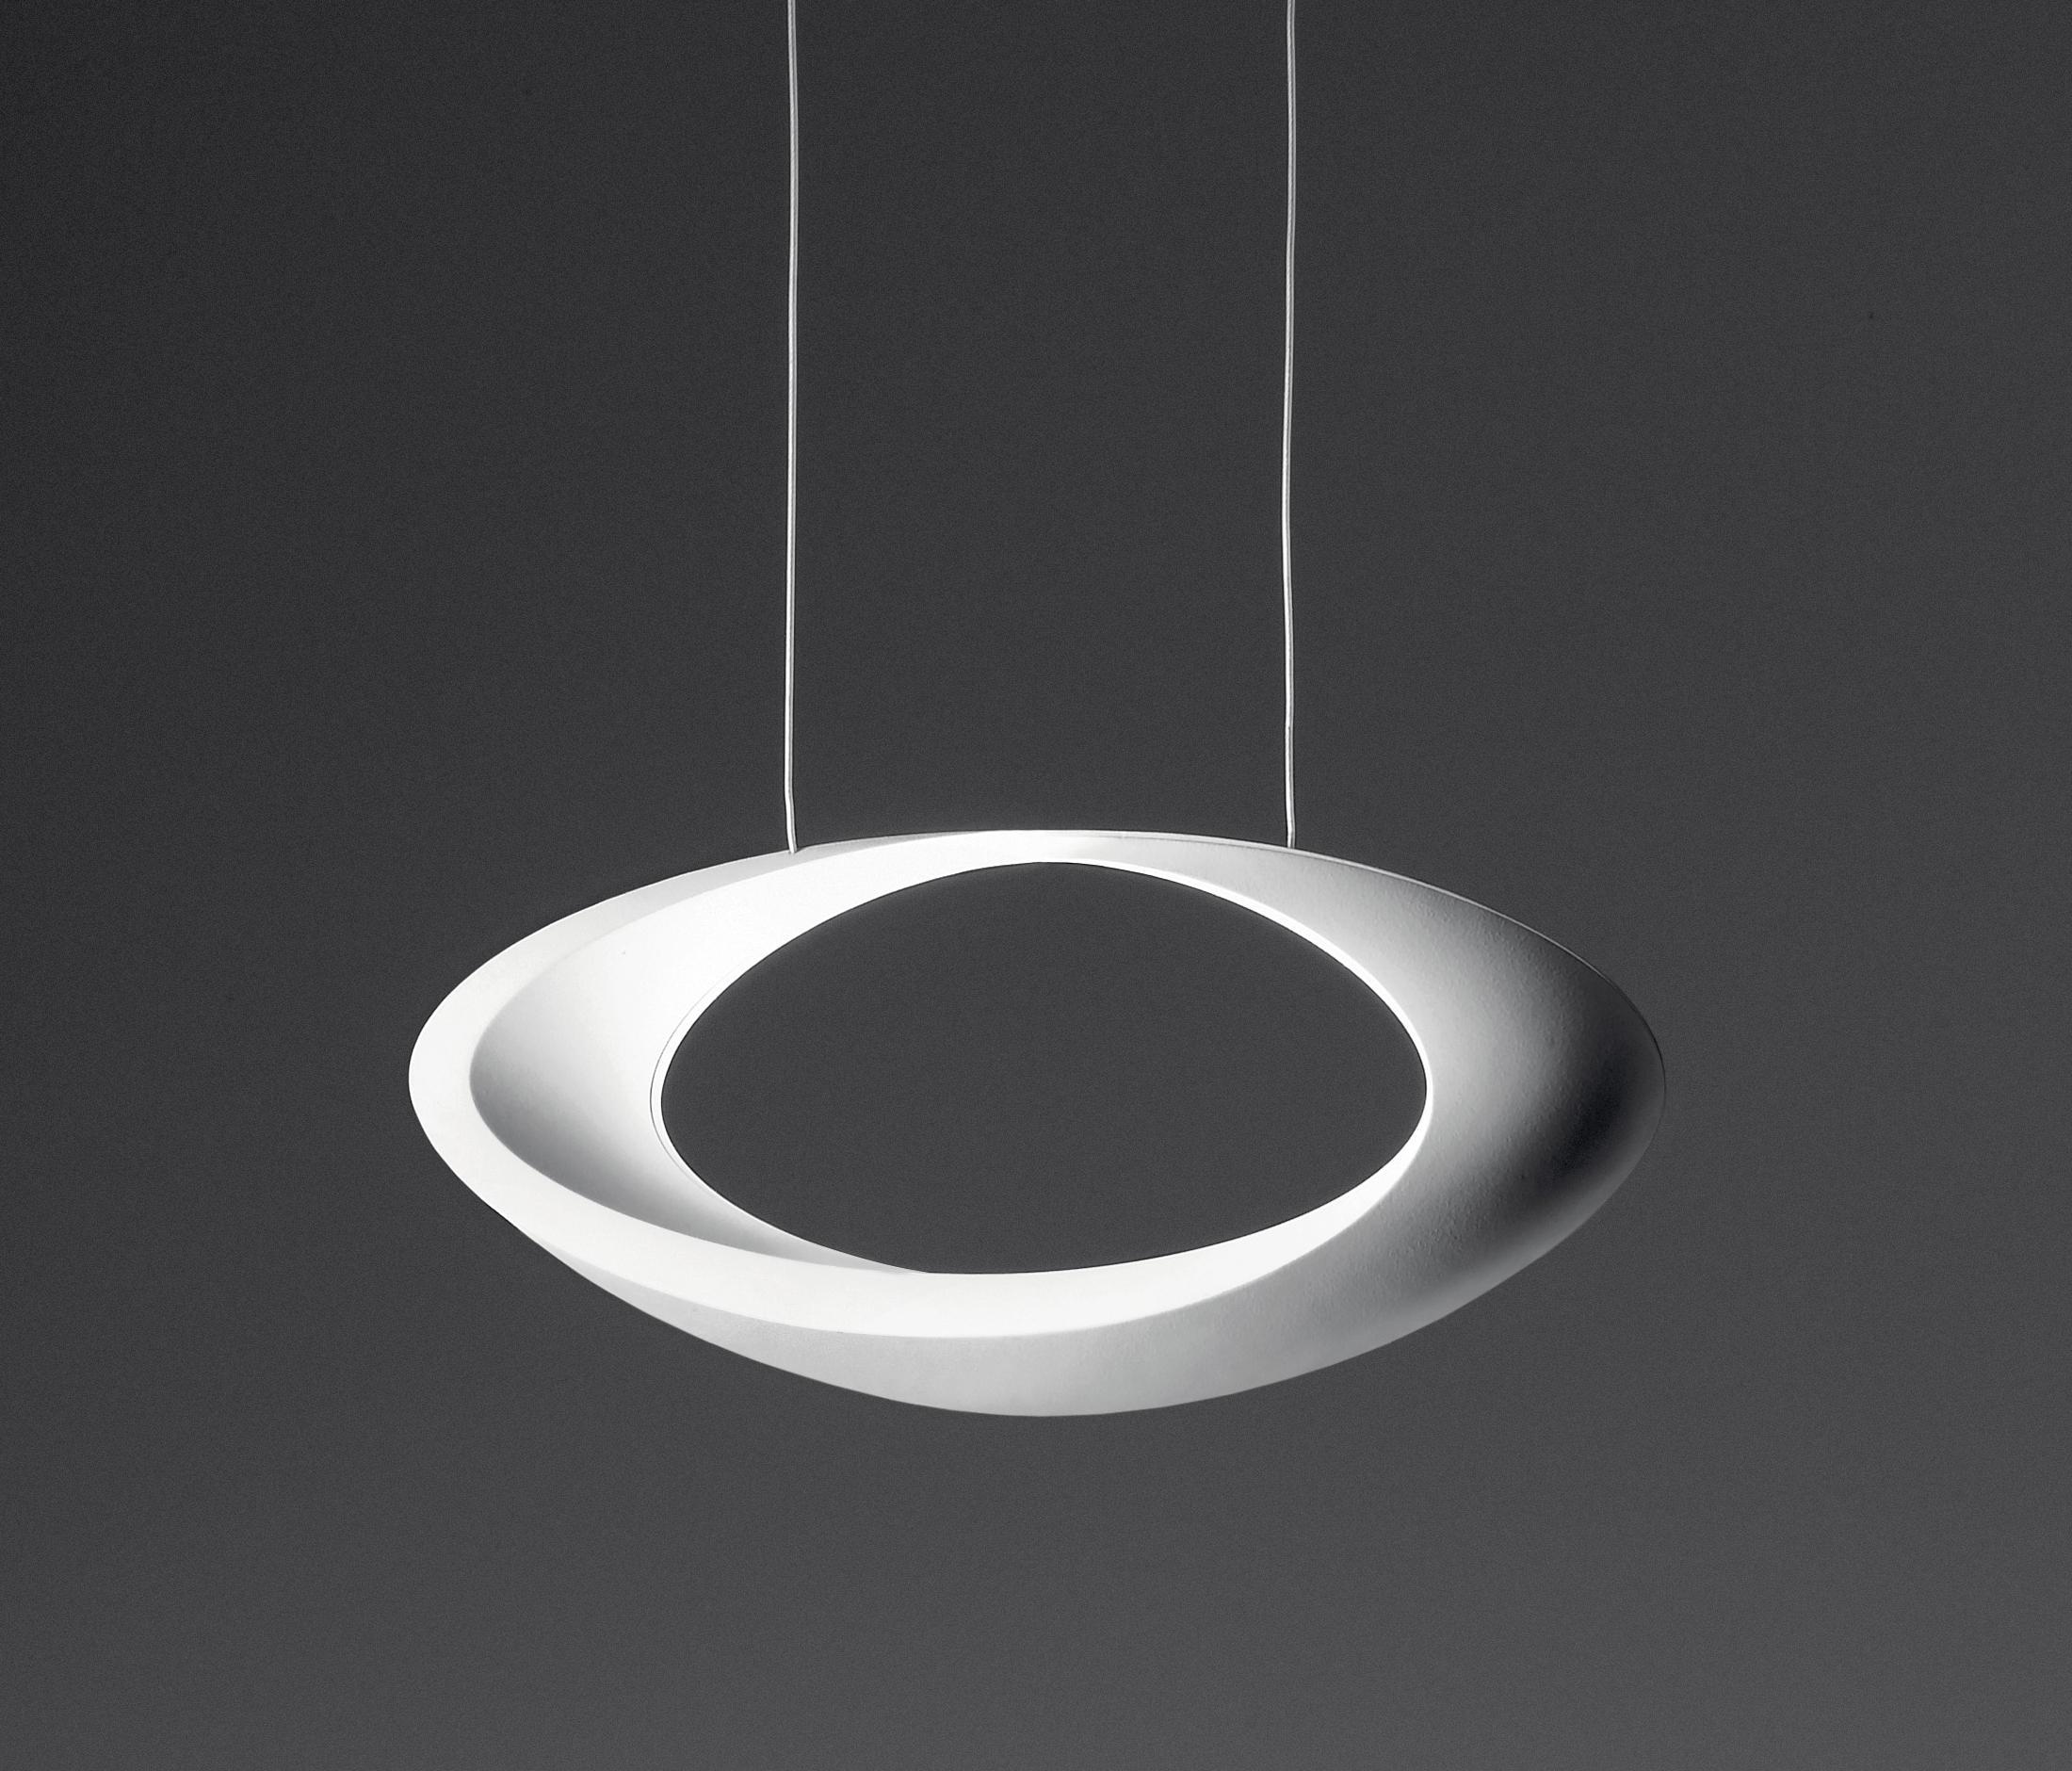 cabildo pendelleuchte allgemeinbeleuchtung von artemide. Black Bedroom Furniture Sets. Home Design Ideas